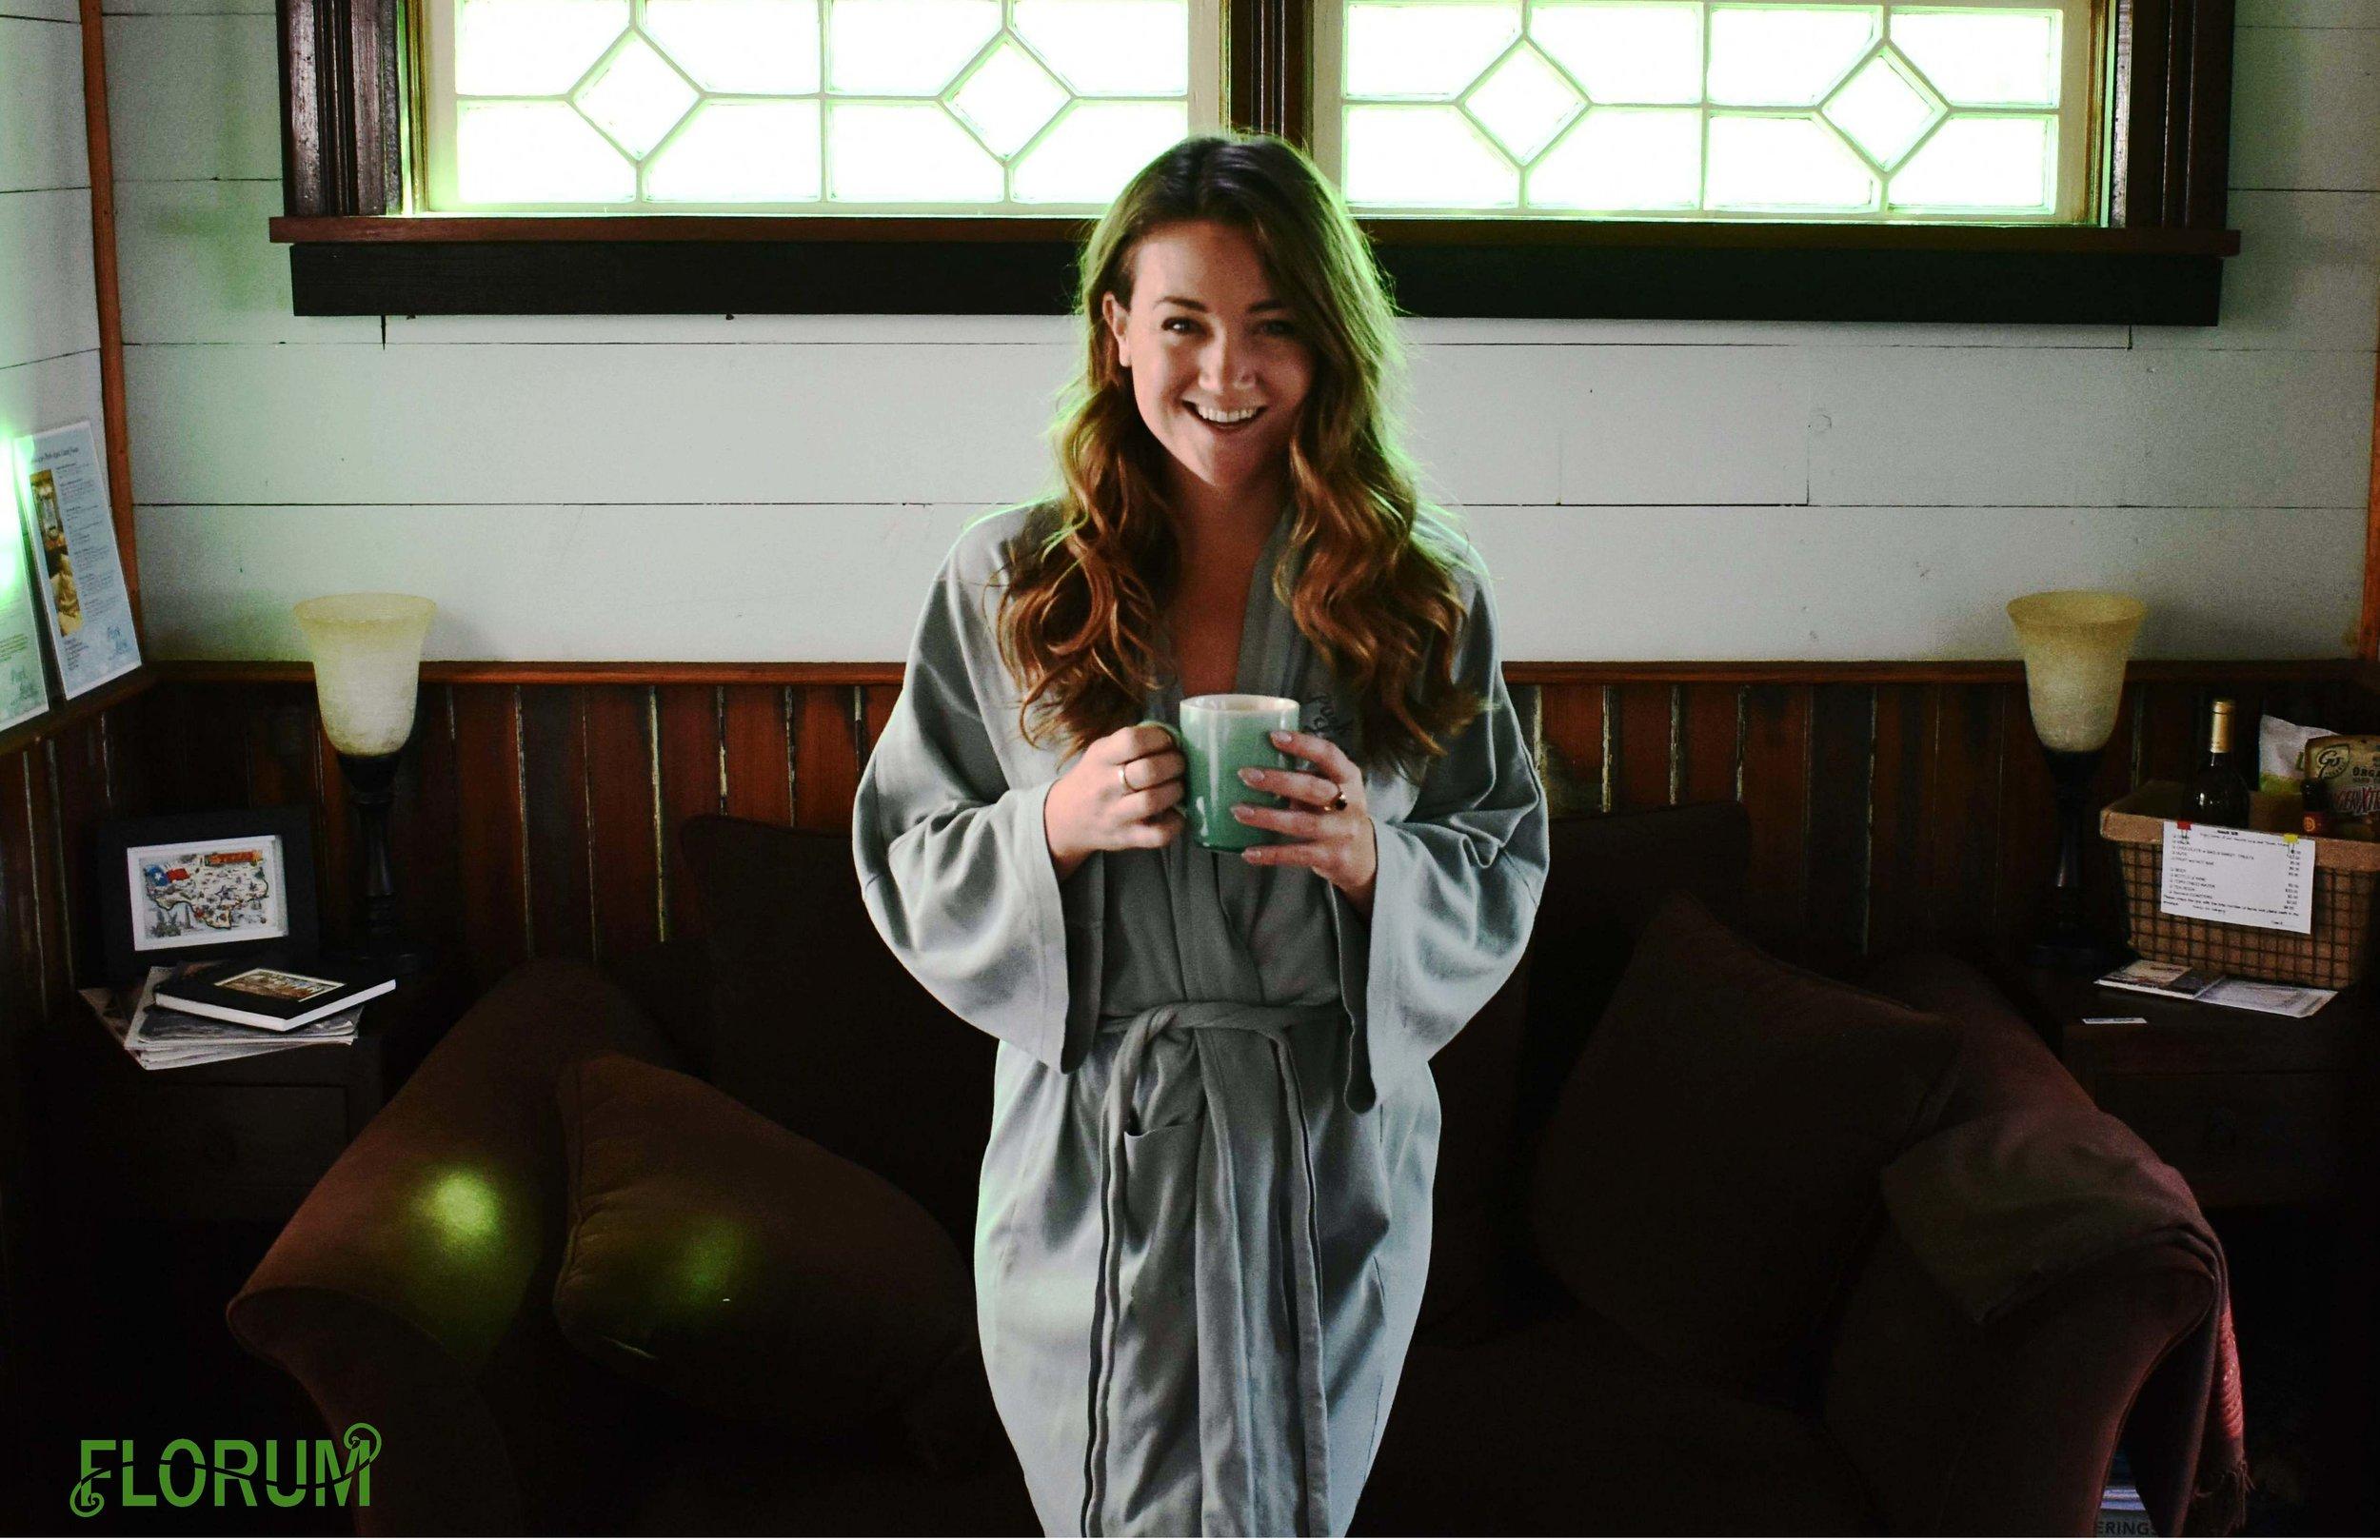 xoxo Noelle Lynne - Founder & Editor of Florum Fashion MagazineEco TravelerNon Dairy VegetarianSustainable Fashionista